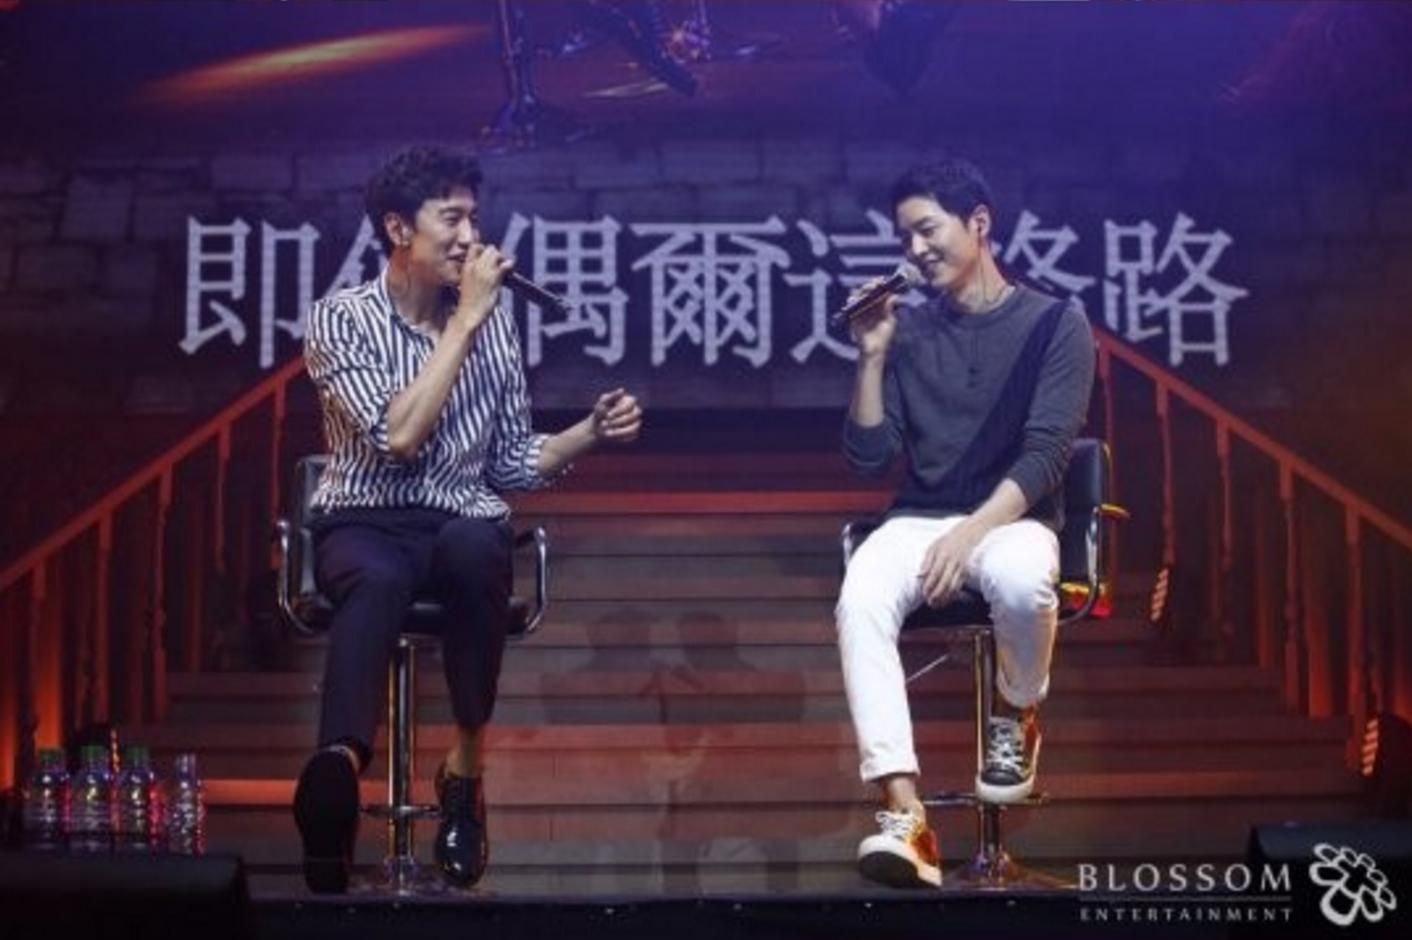 Watch Song Joong Ki And Lee Kwang Soo Serenade Fans With A Duet